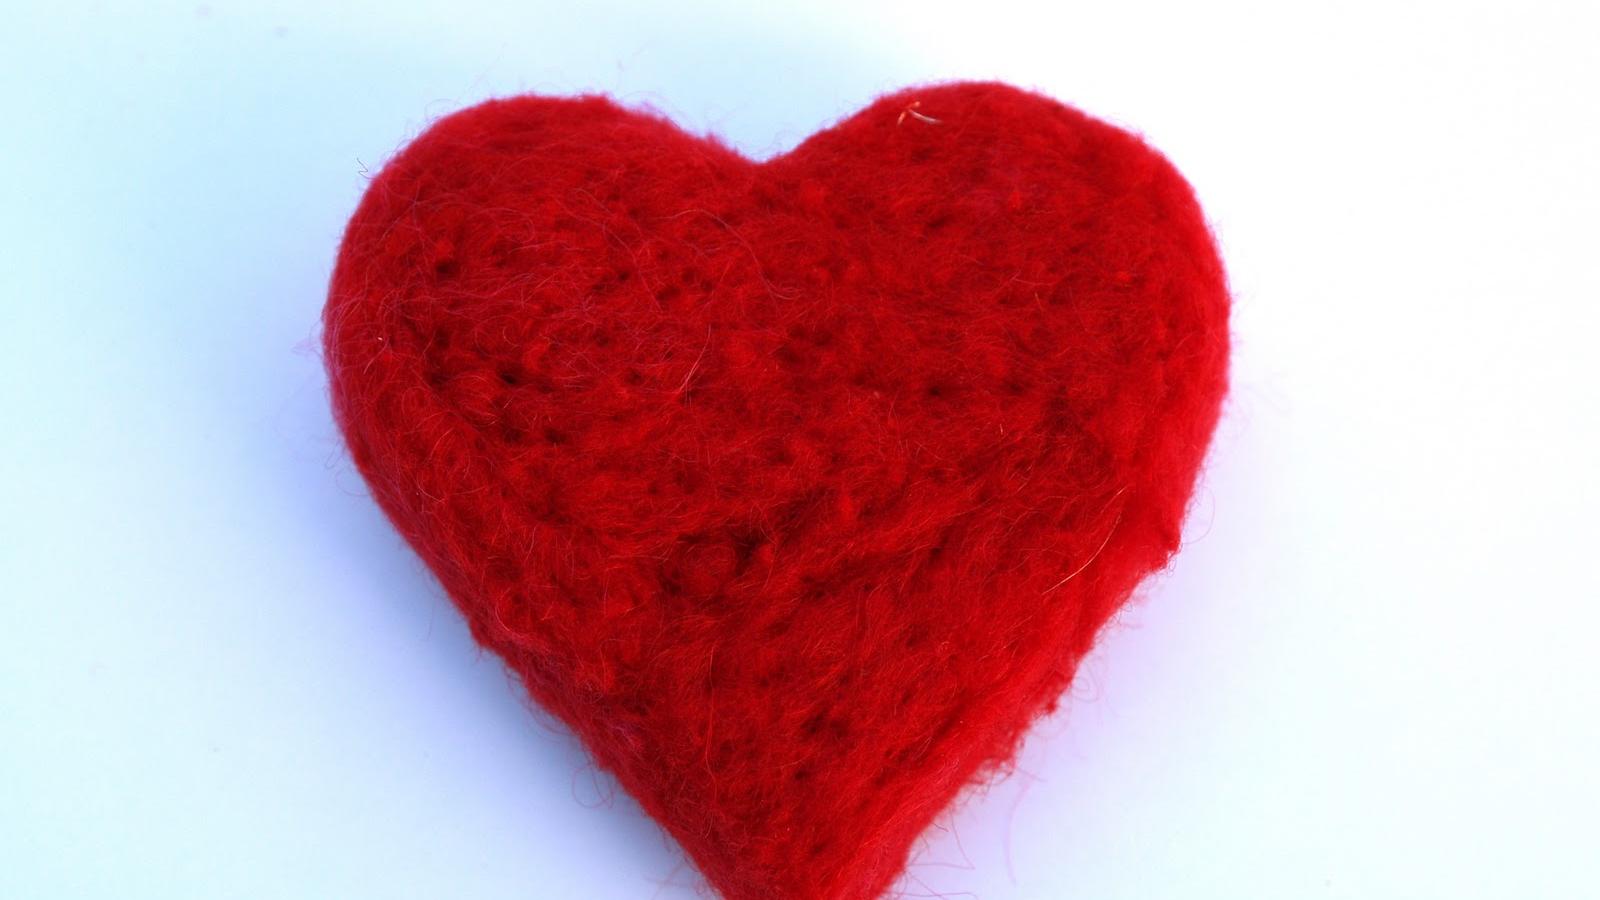 Free Download Red Heart Love Wallpaper Hd 1398 Wallpaper High